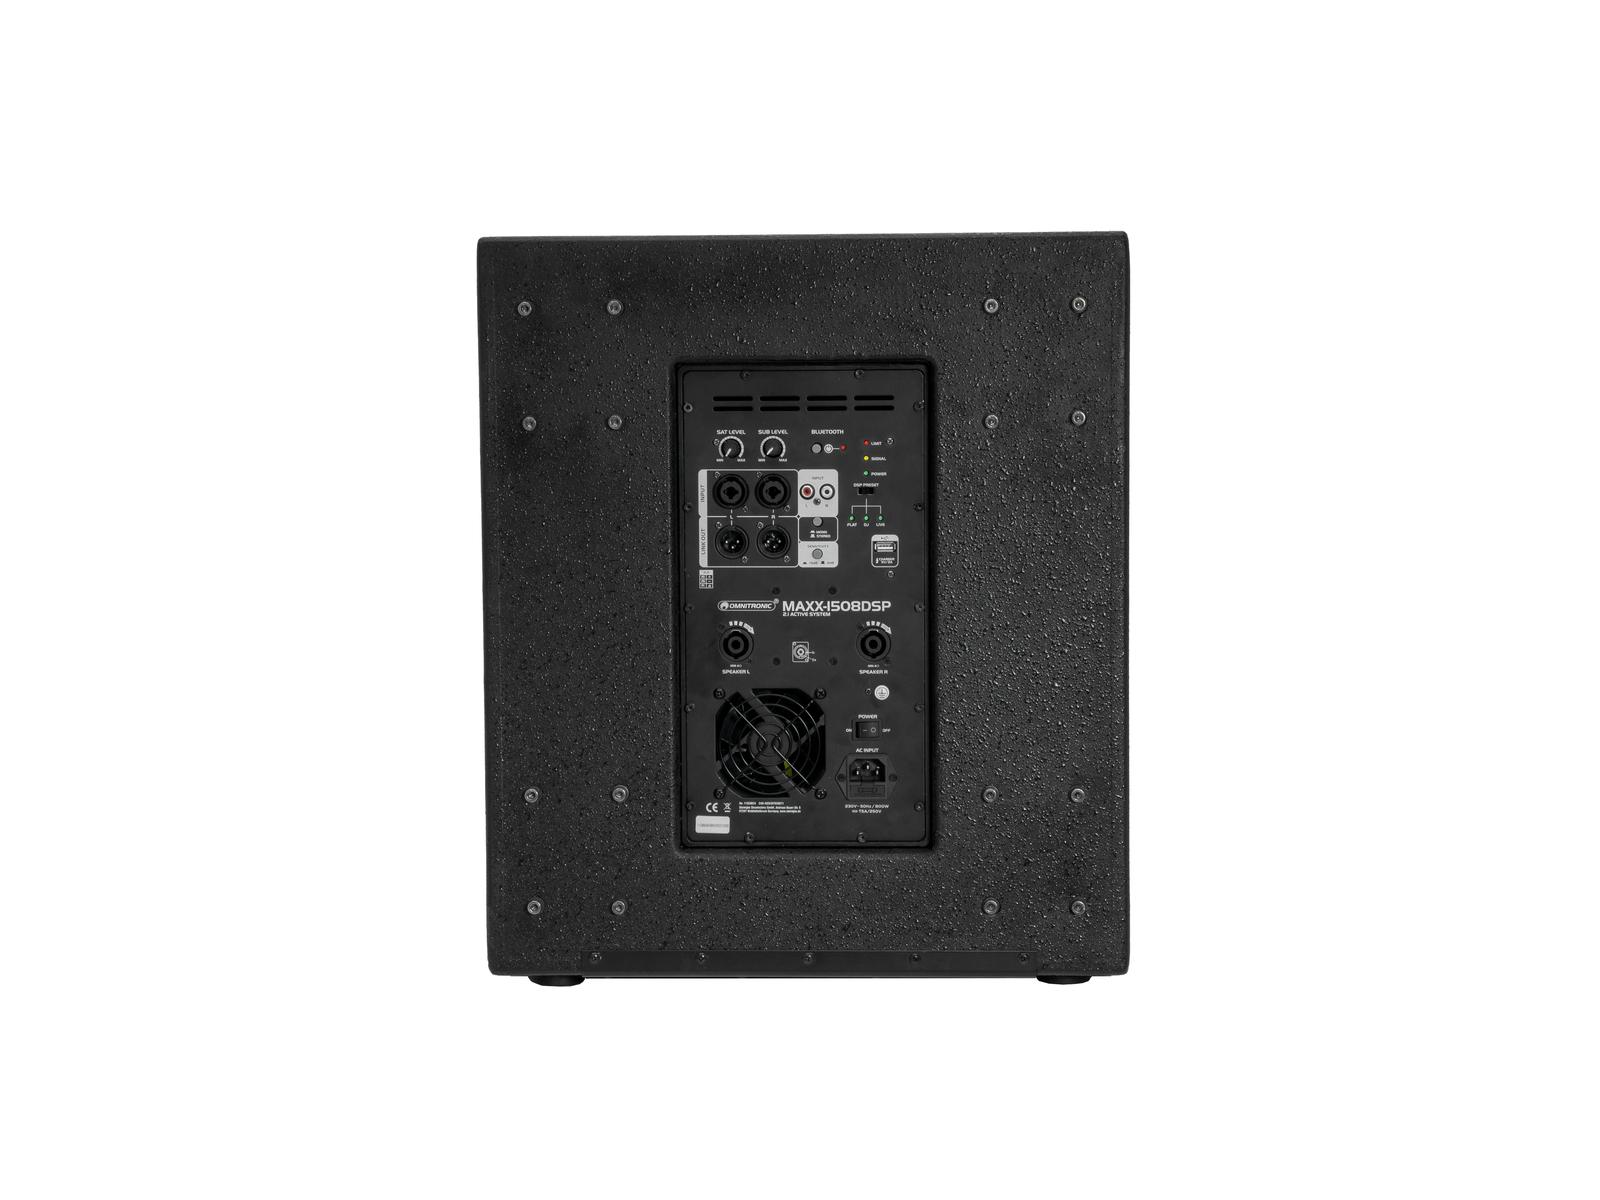 OMNITRONIC MAXX-1508DSP 2.1 Aktiv-Subwoofer